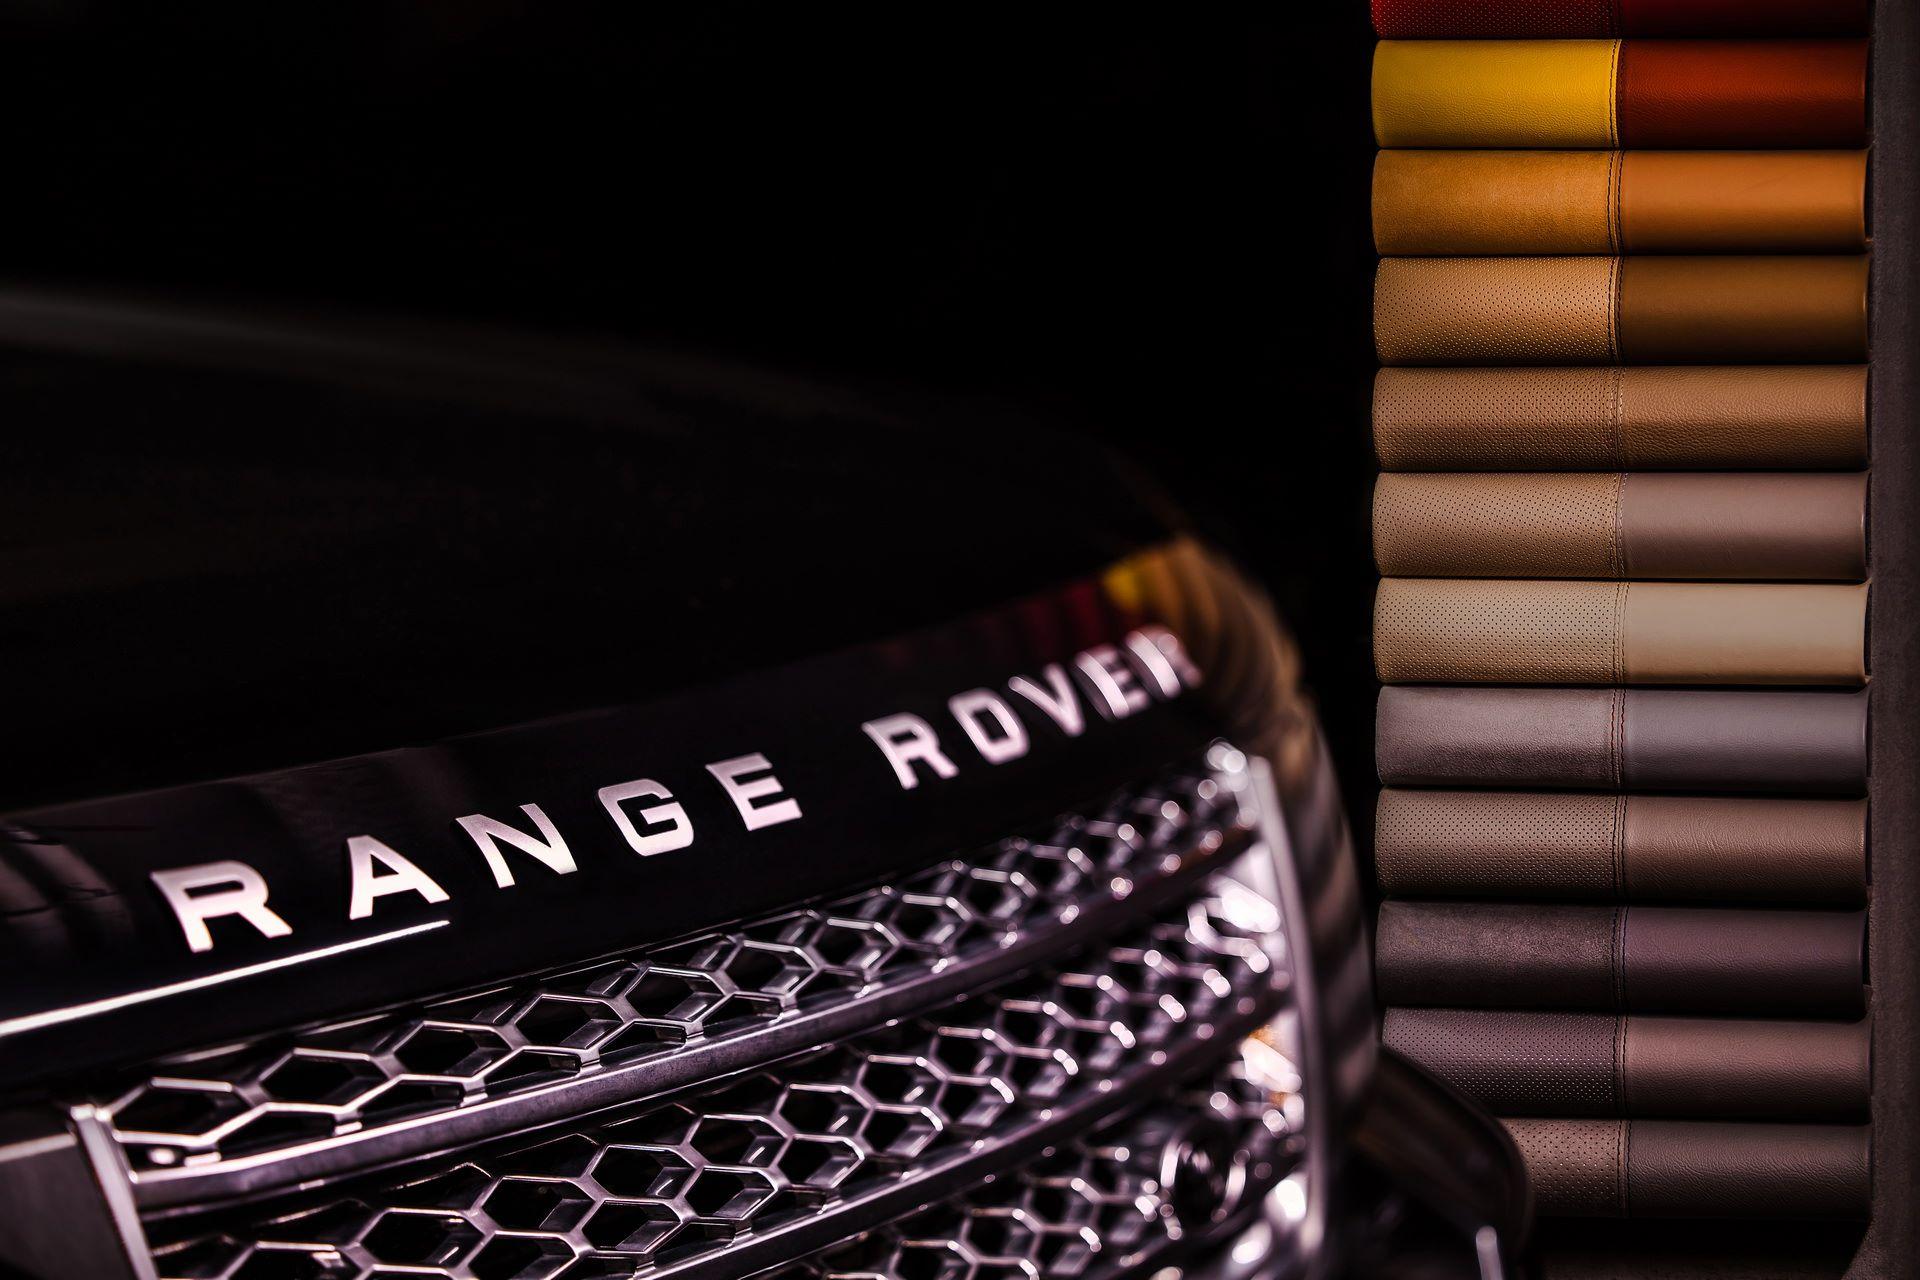 Range-Rover-Autobiography-By-Vilner-2